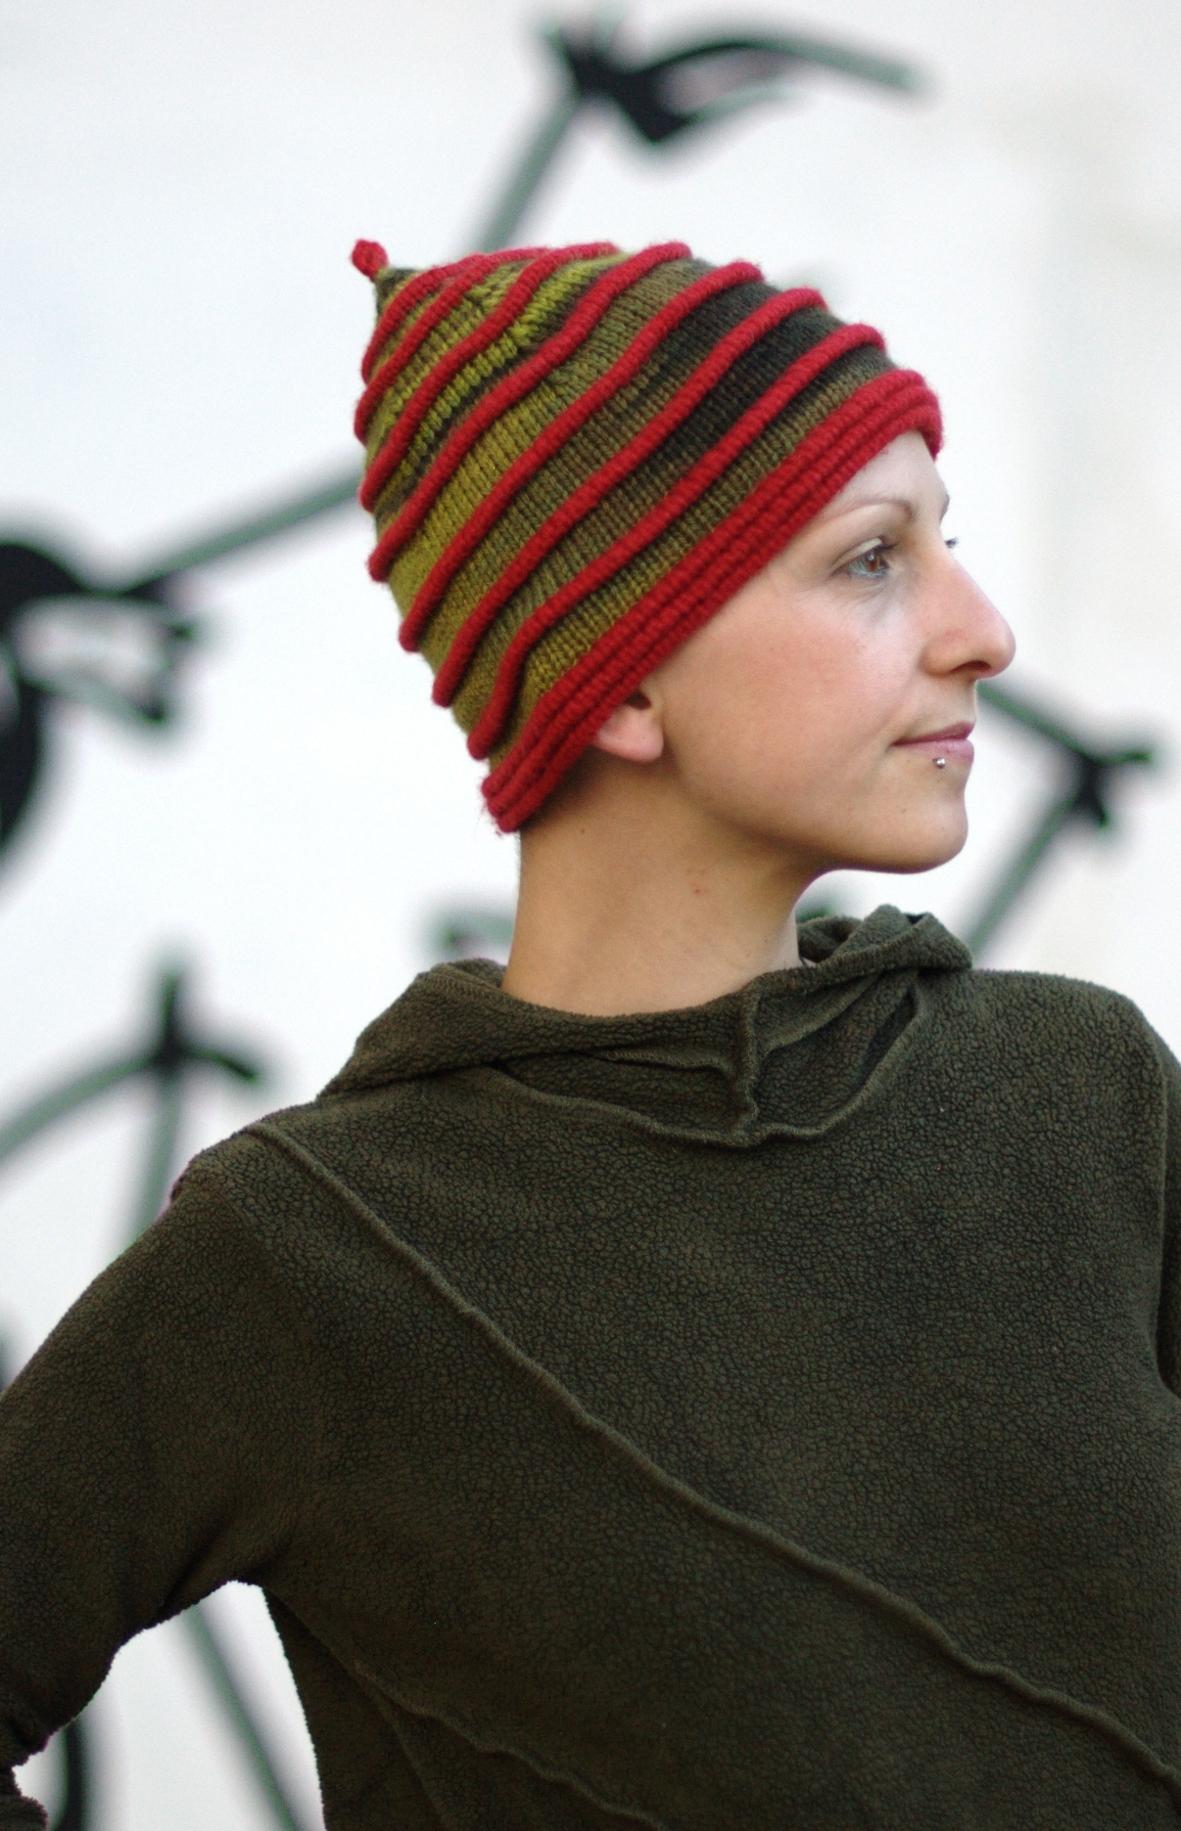 Beelore pixie Hat knitting pattern